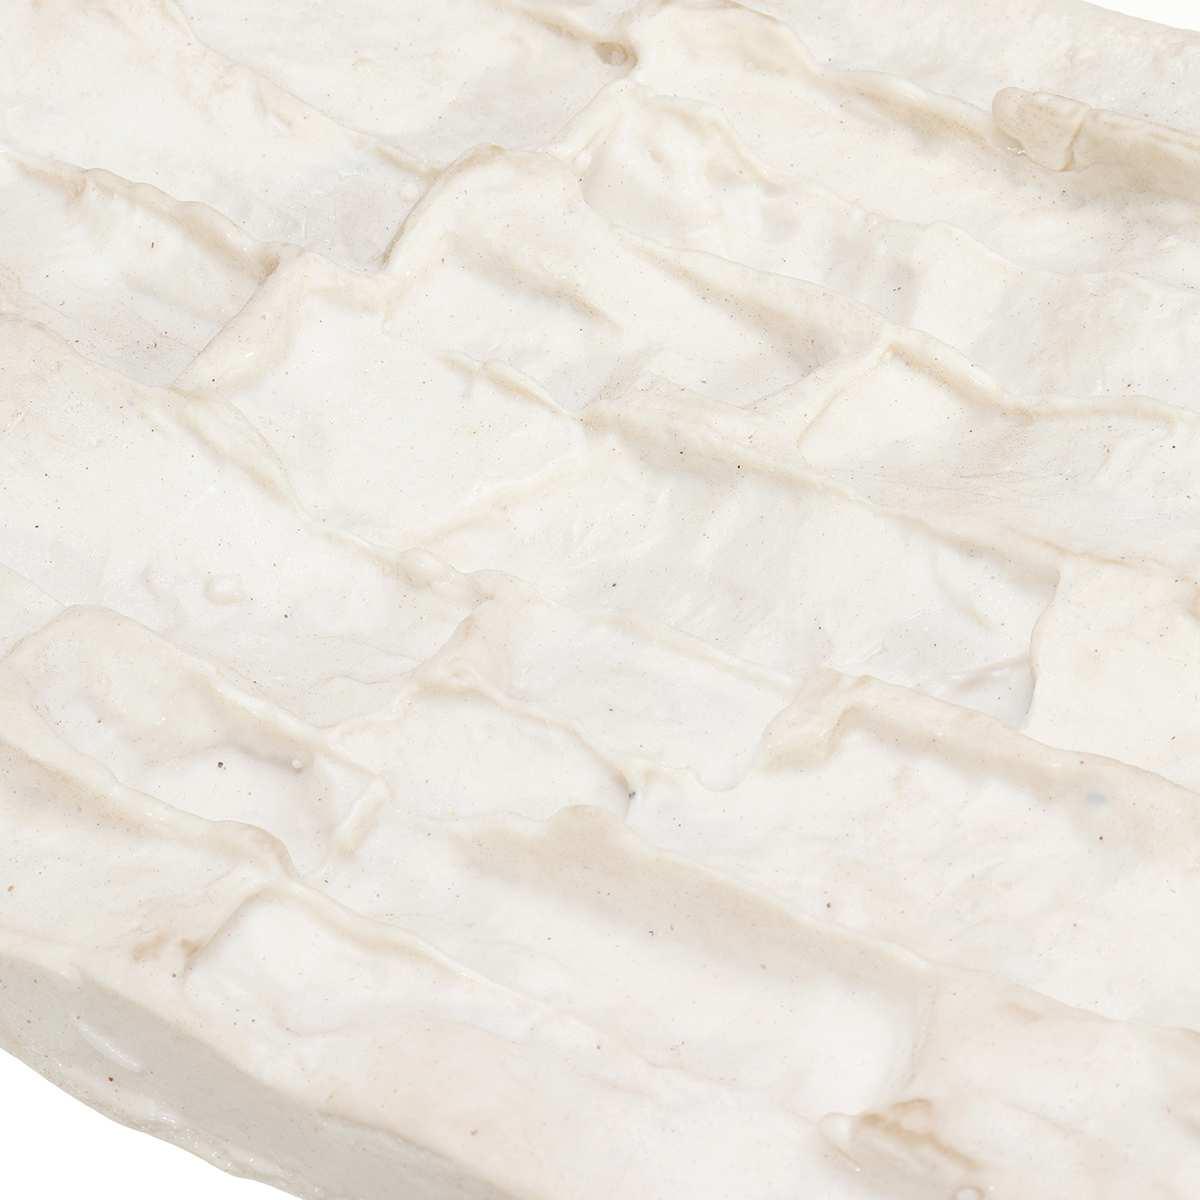 Polyurethane Molds For Concrete Garden House Decor Texture Wall Floors Molds Cement Plaster Stamps Model Molds Rubber Molds